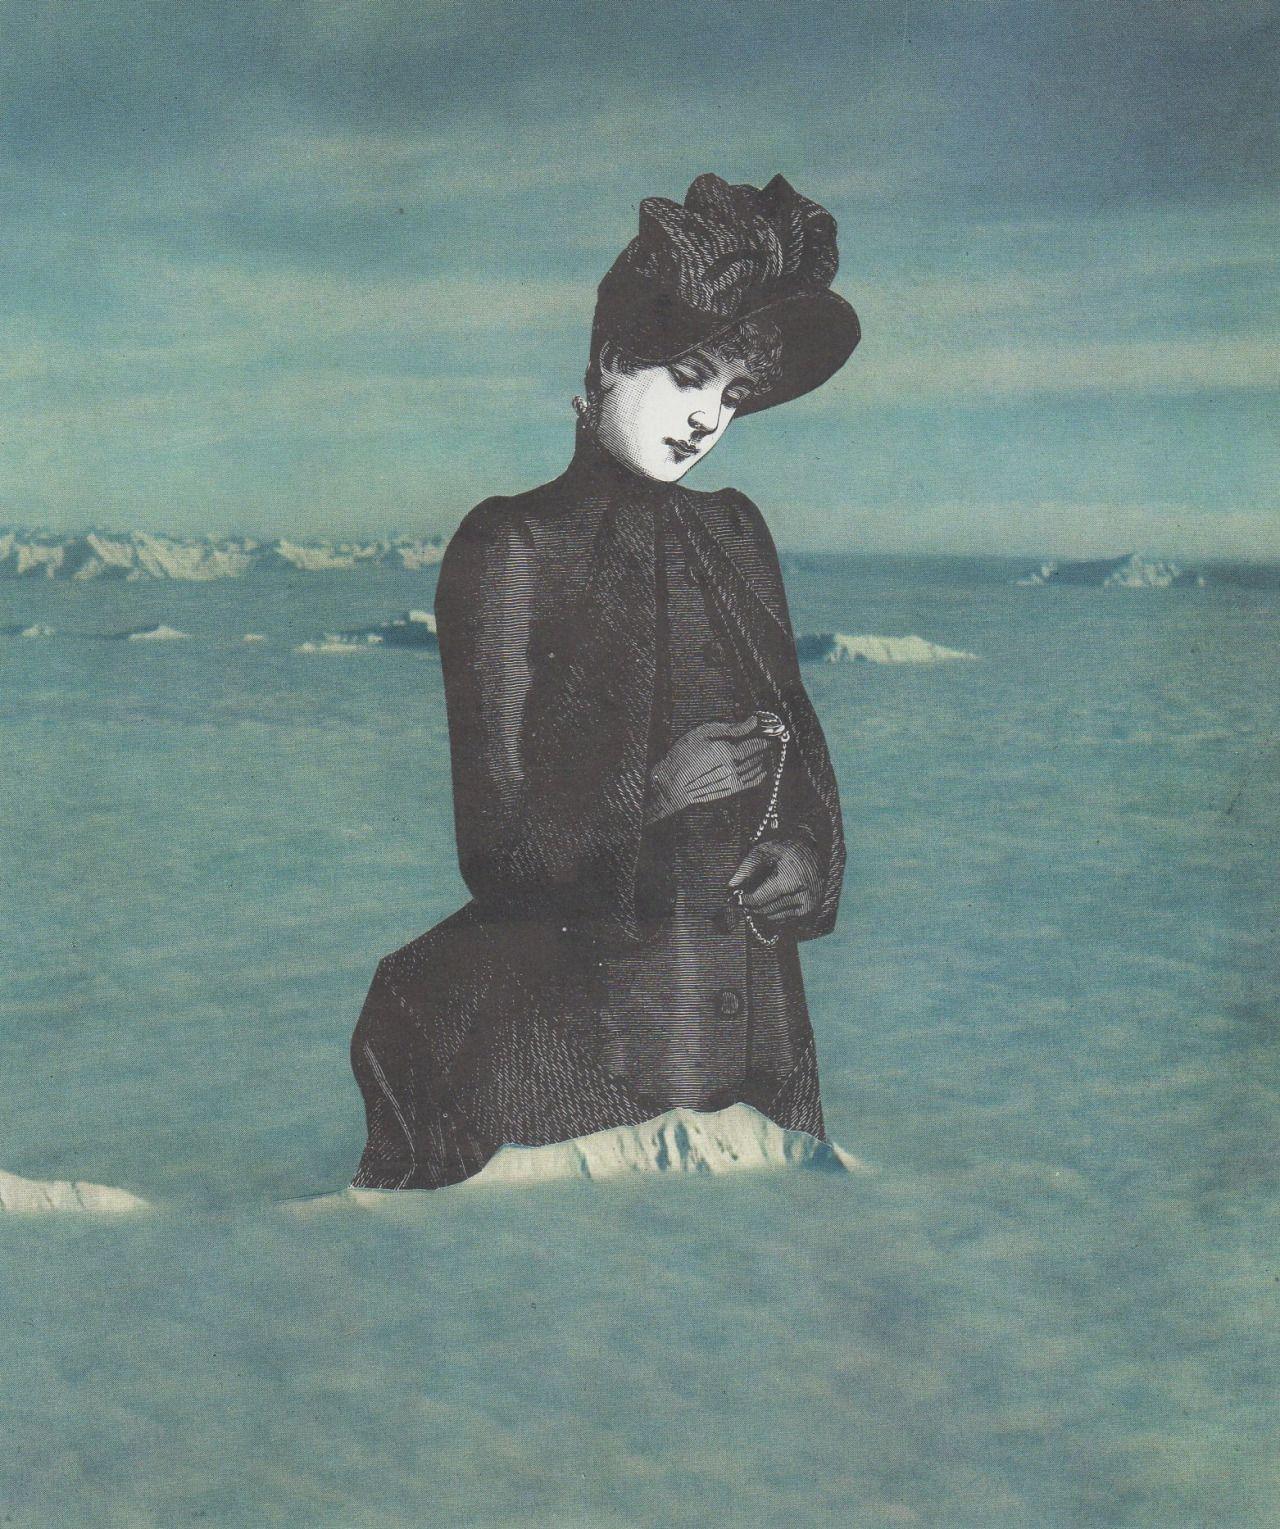 surrealism:  Time Itself Must Have An End by Tim Lukeman, 2014. Digital artwork.